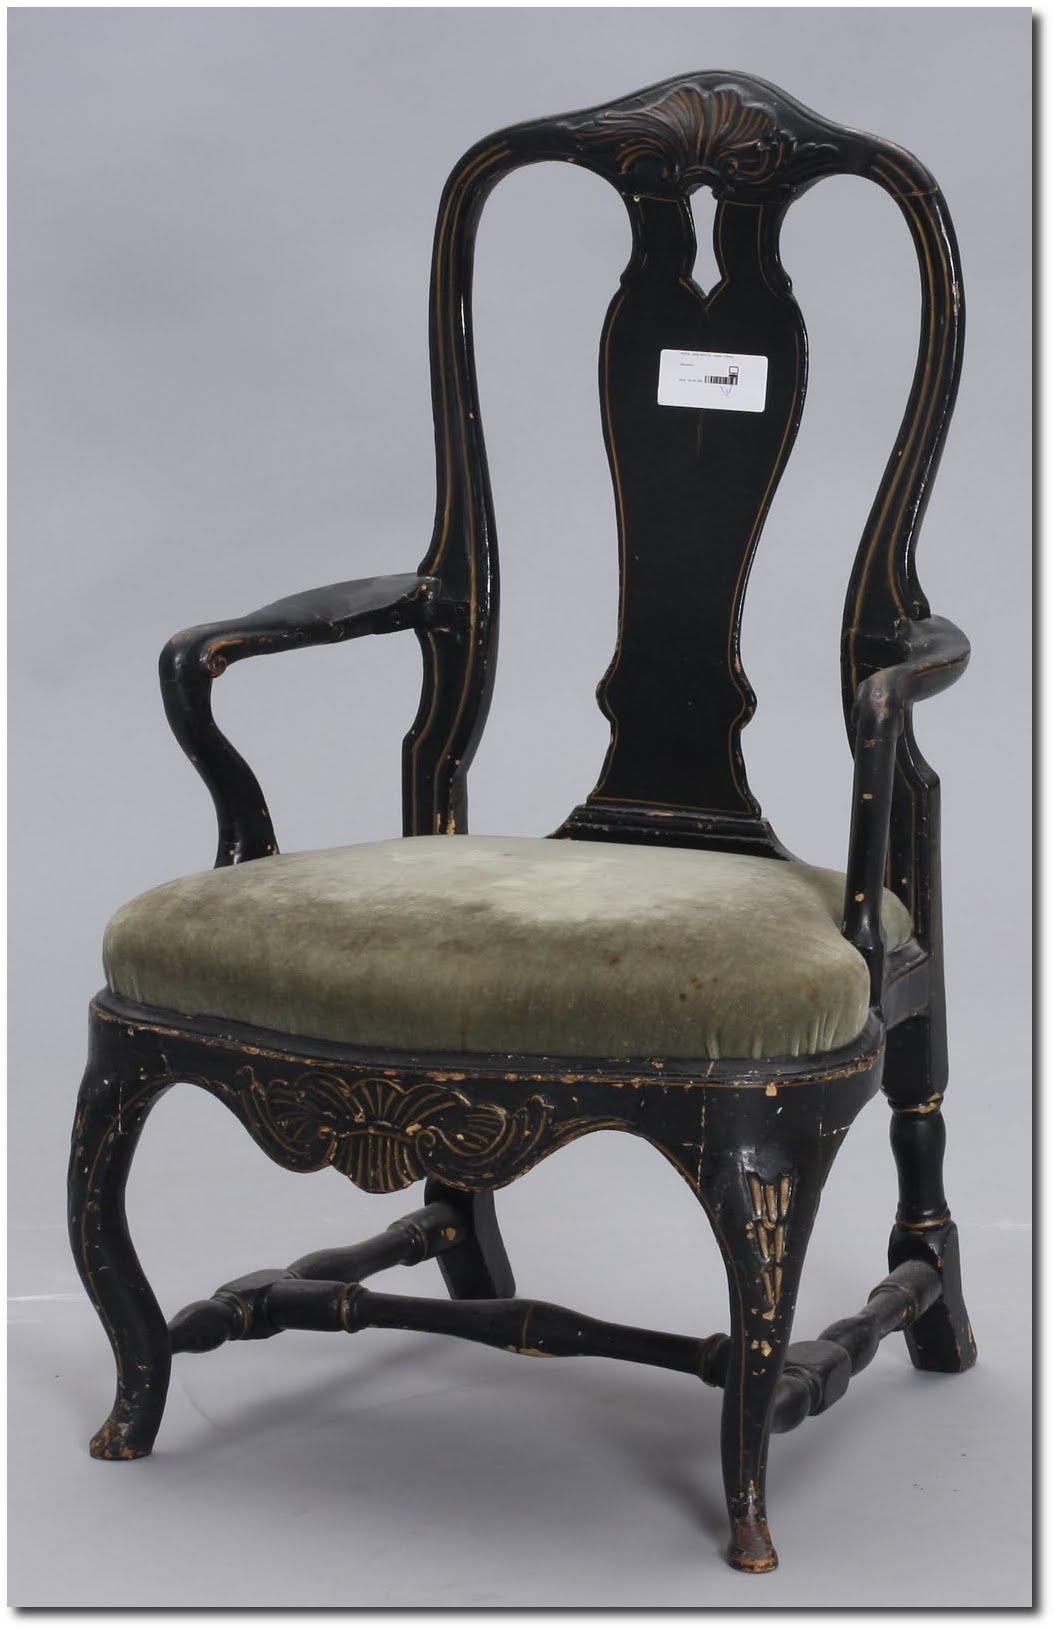 rococo-swedish-armchair-masterhenriks-blogspot-2